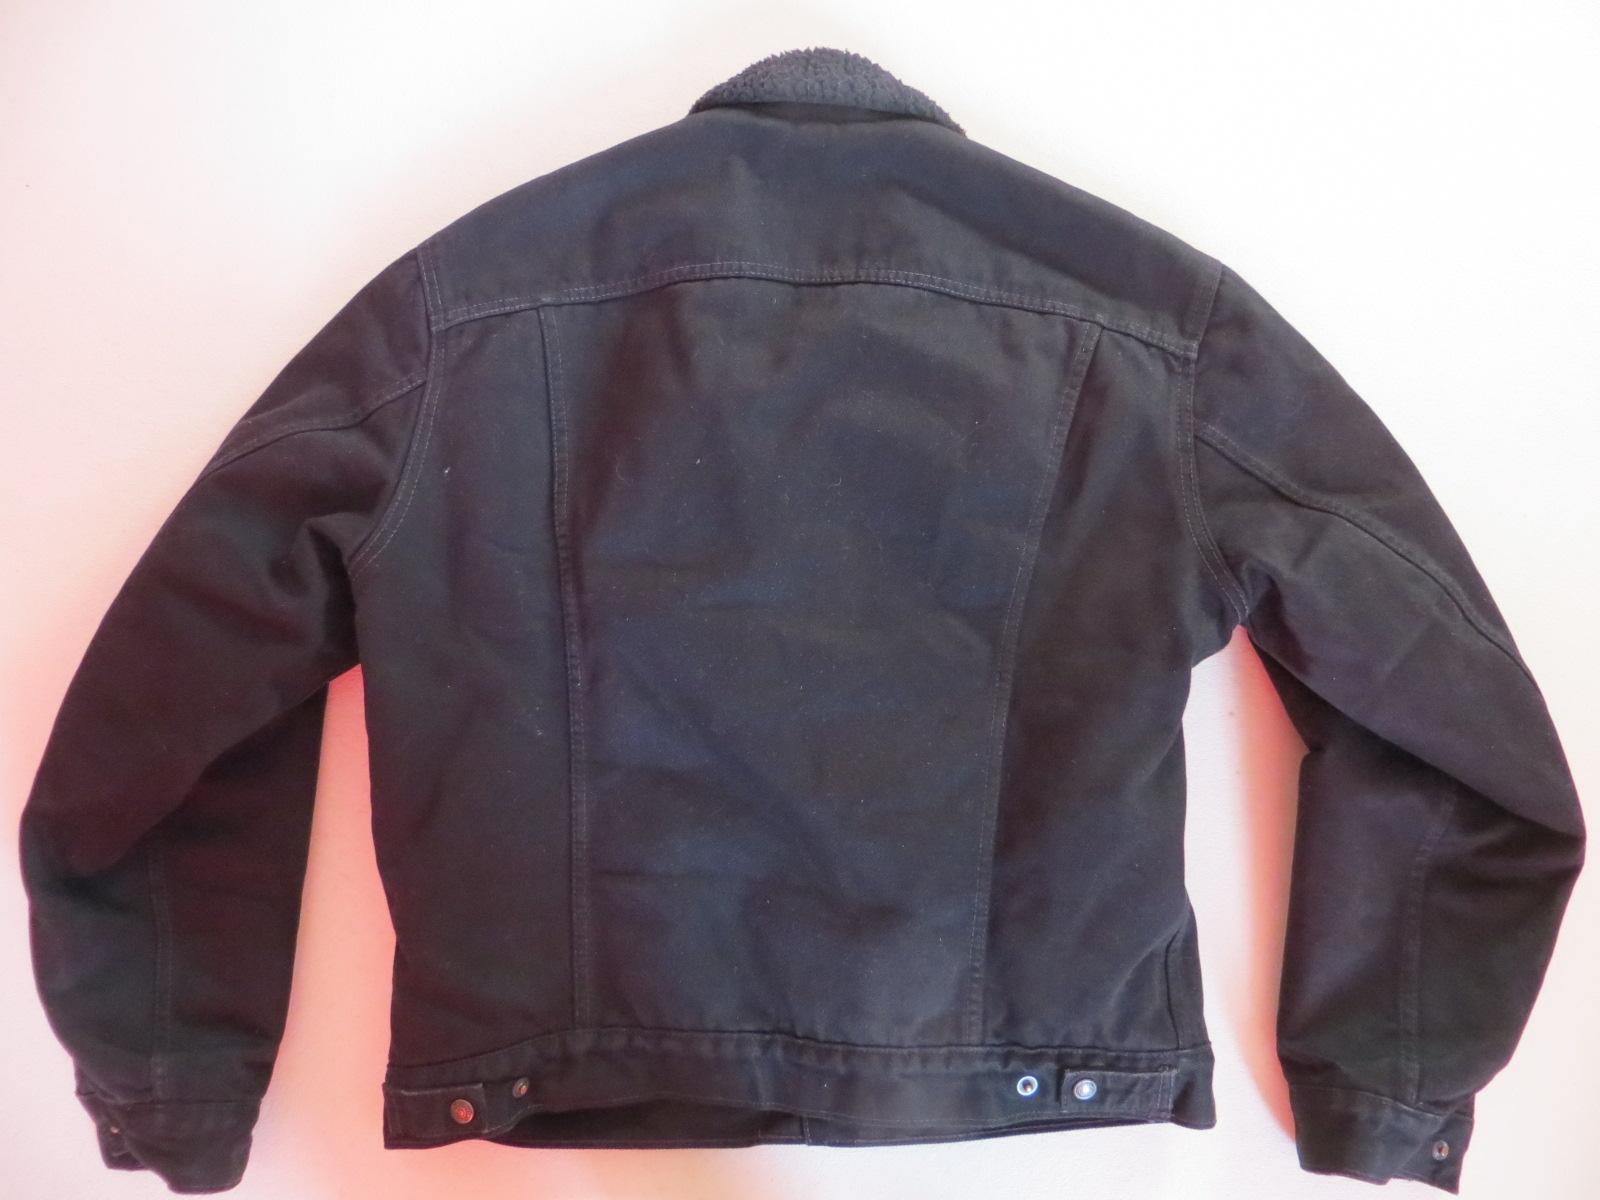 levi 39 s jacke jeansjacke mit schwarzem teddy fell gr. Black Bedroom Furniture Sets. Home Design Ideas